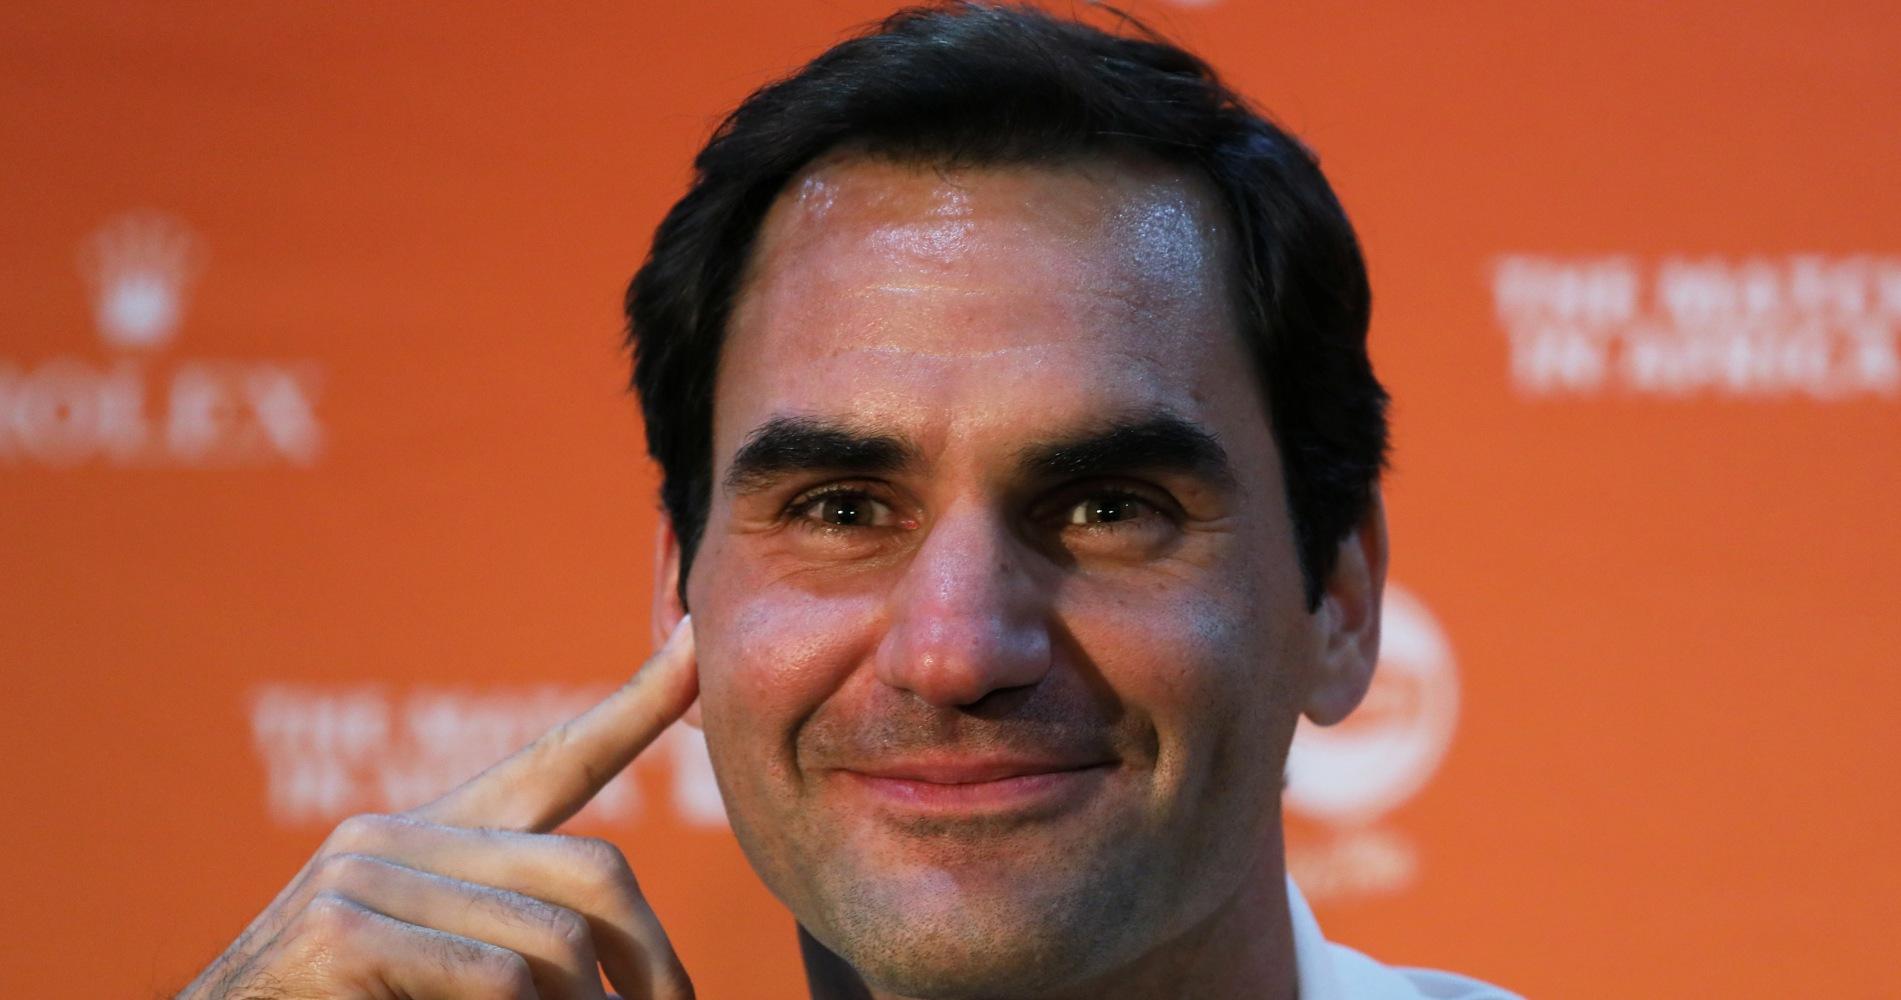 Roger Federer Cape Town 2020